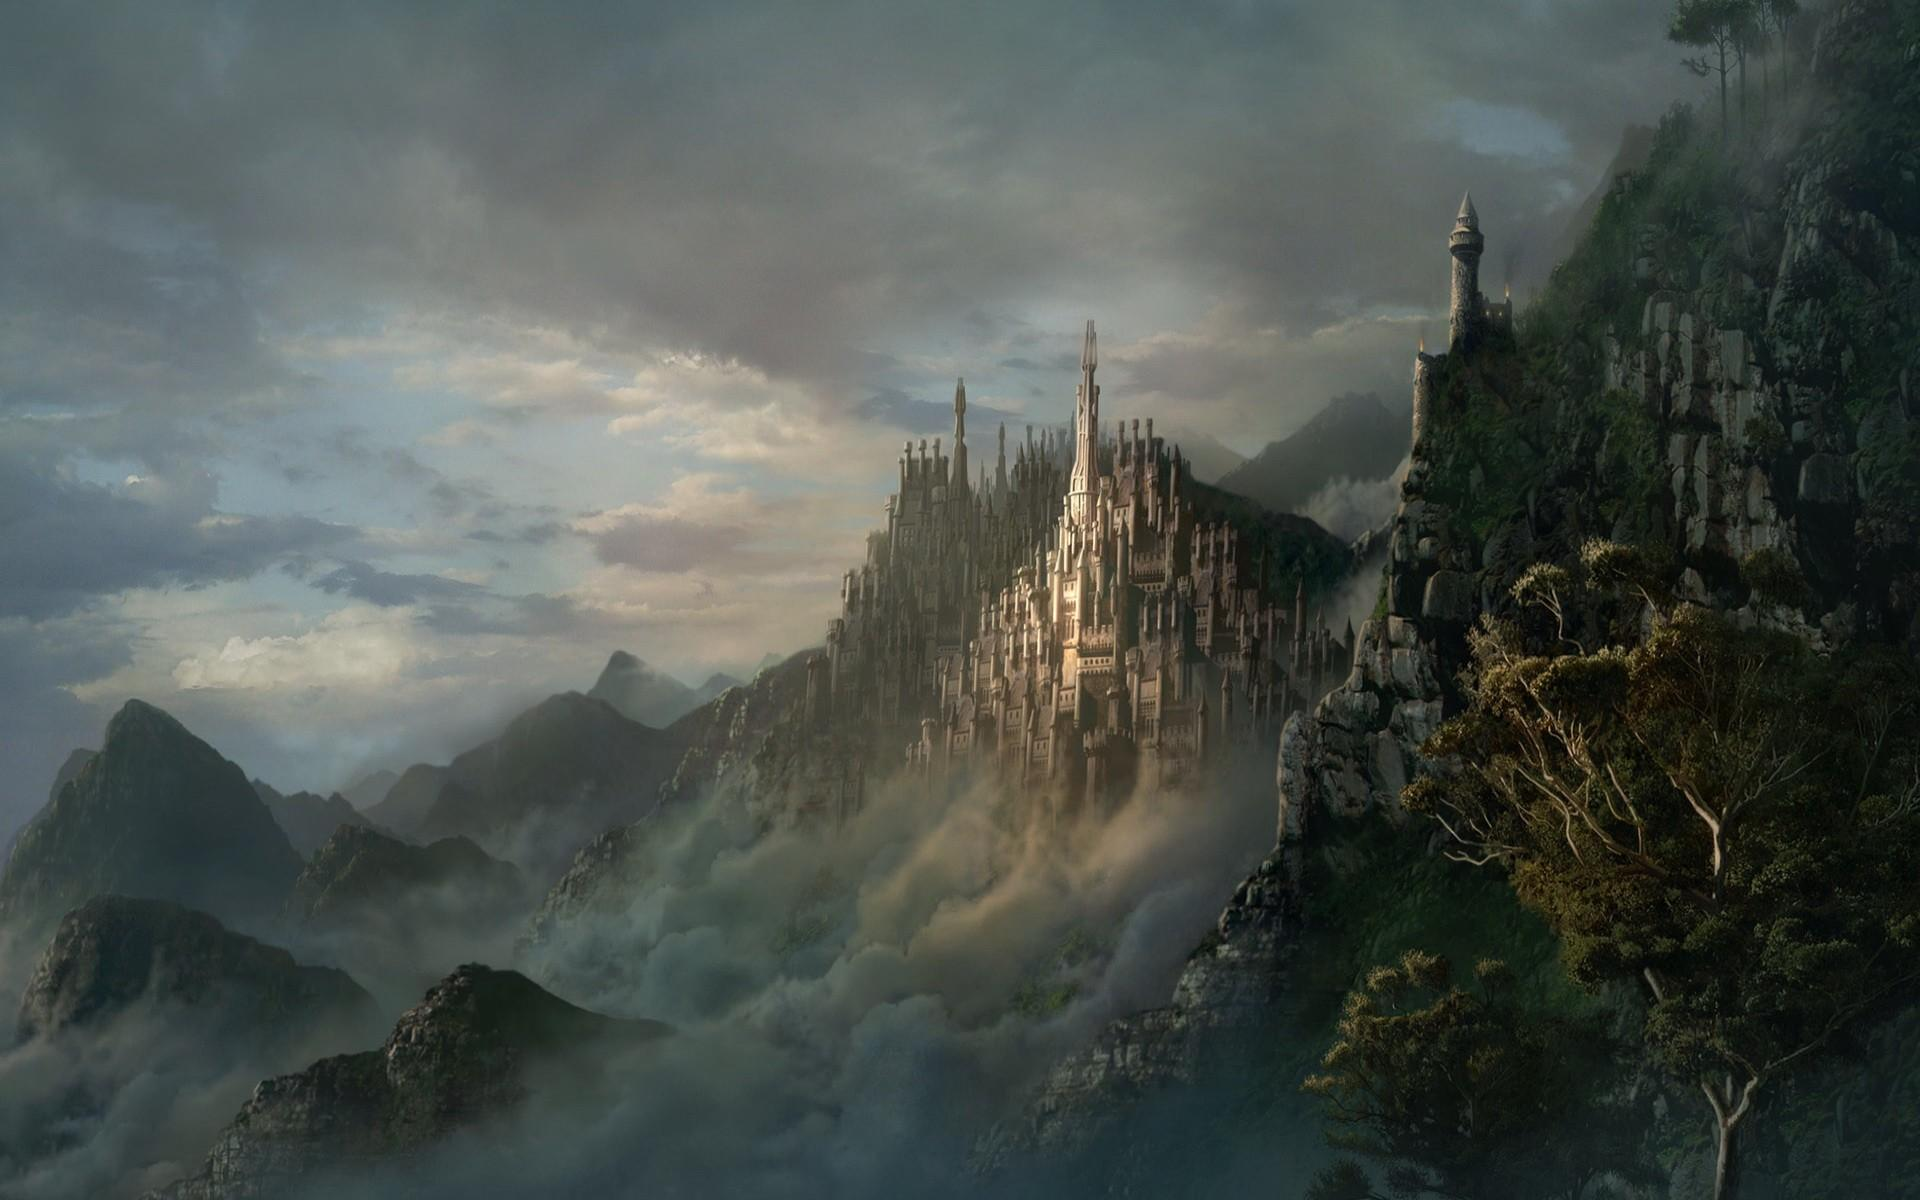 Medieval Castle Desktop Wallpaper   HD Wallpapers Backgrounds of Your 1920x1200